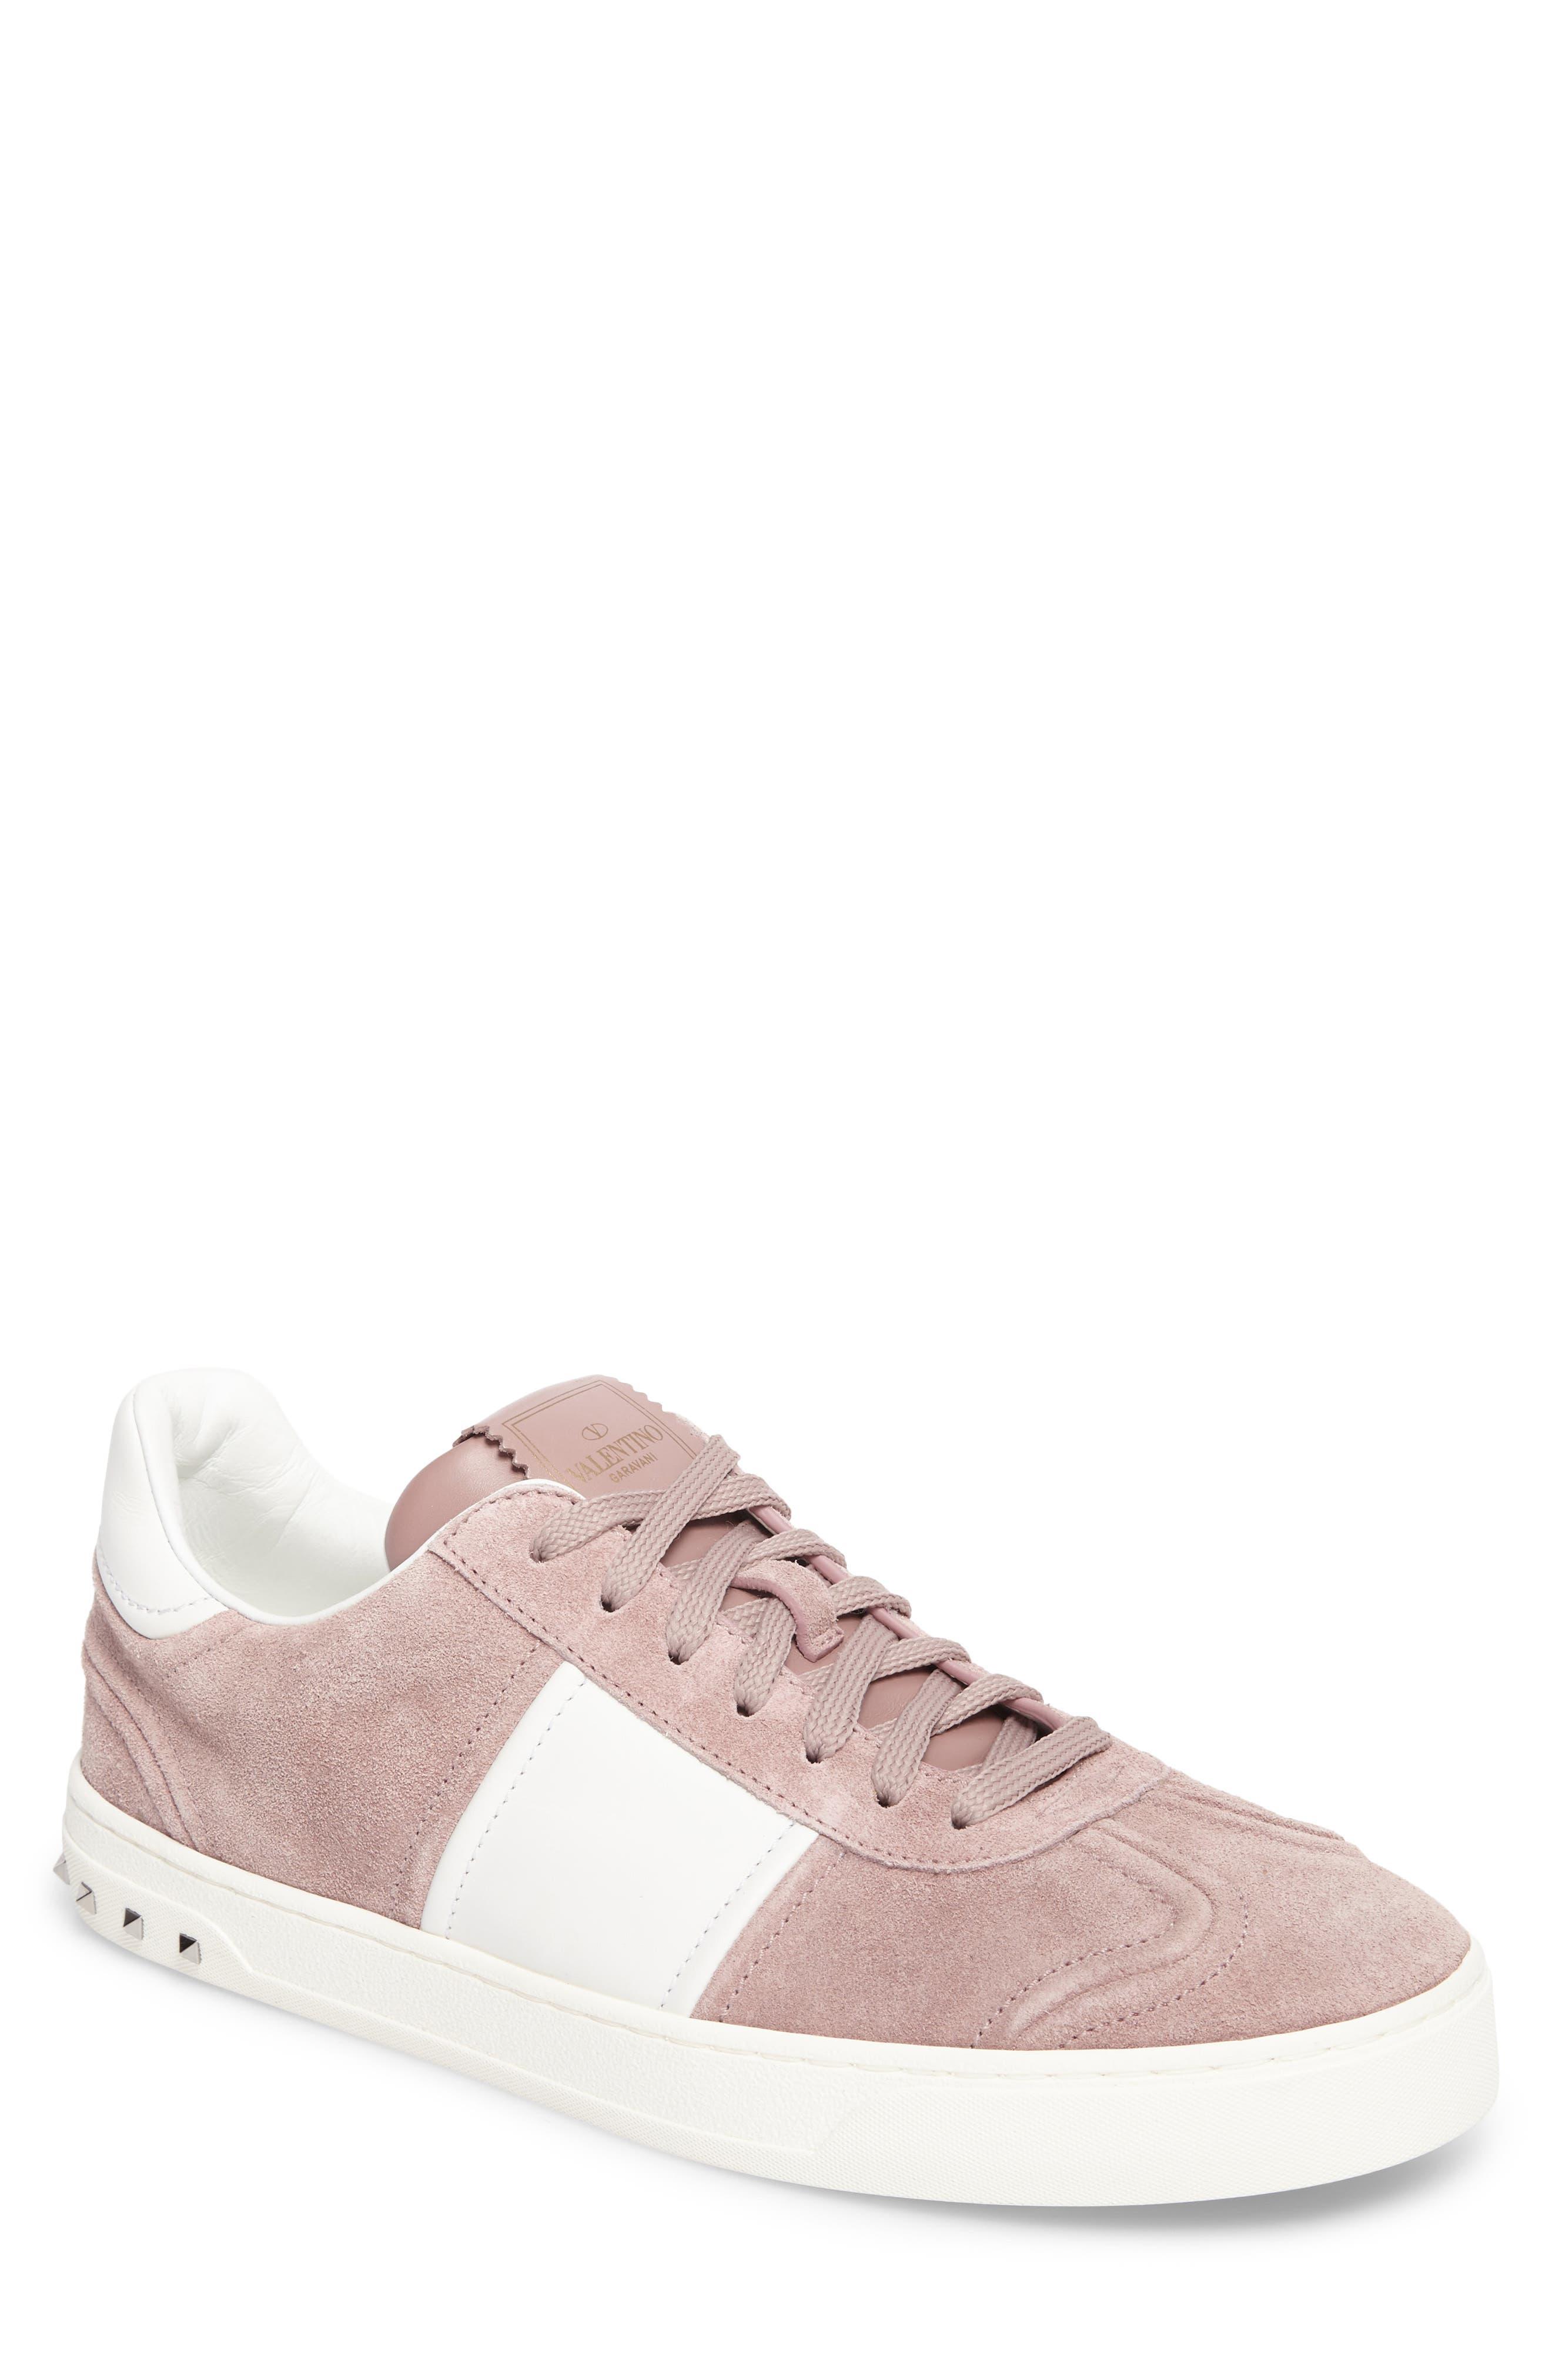 Fly Crew Sneaker,                         Main,                         color, Lipstick/ Bianco